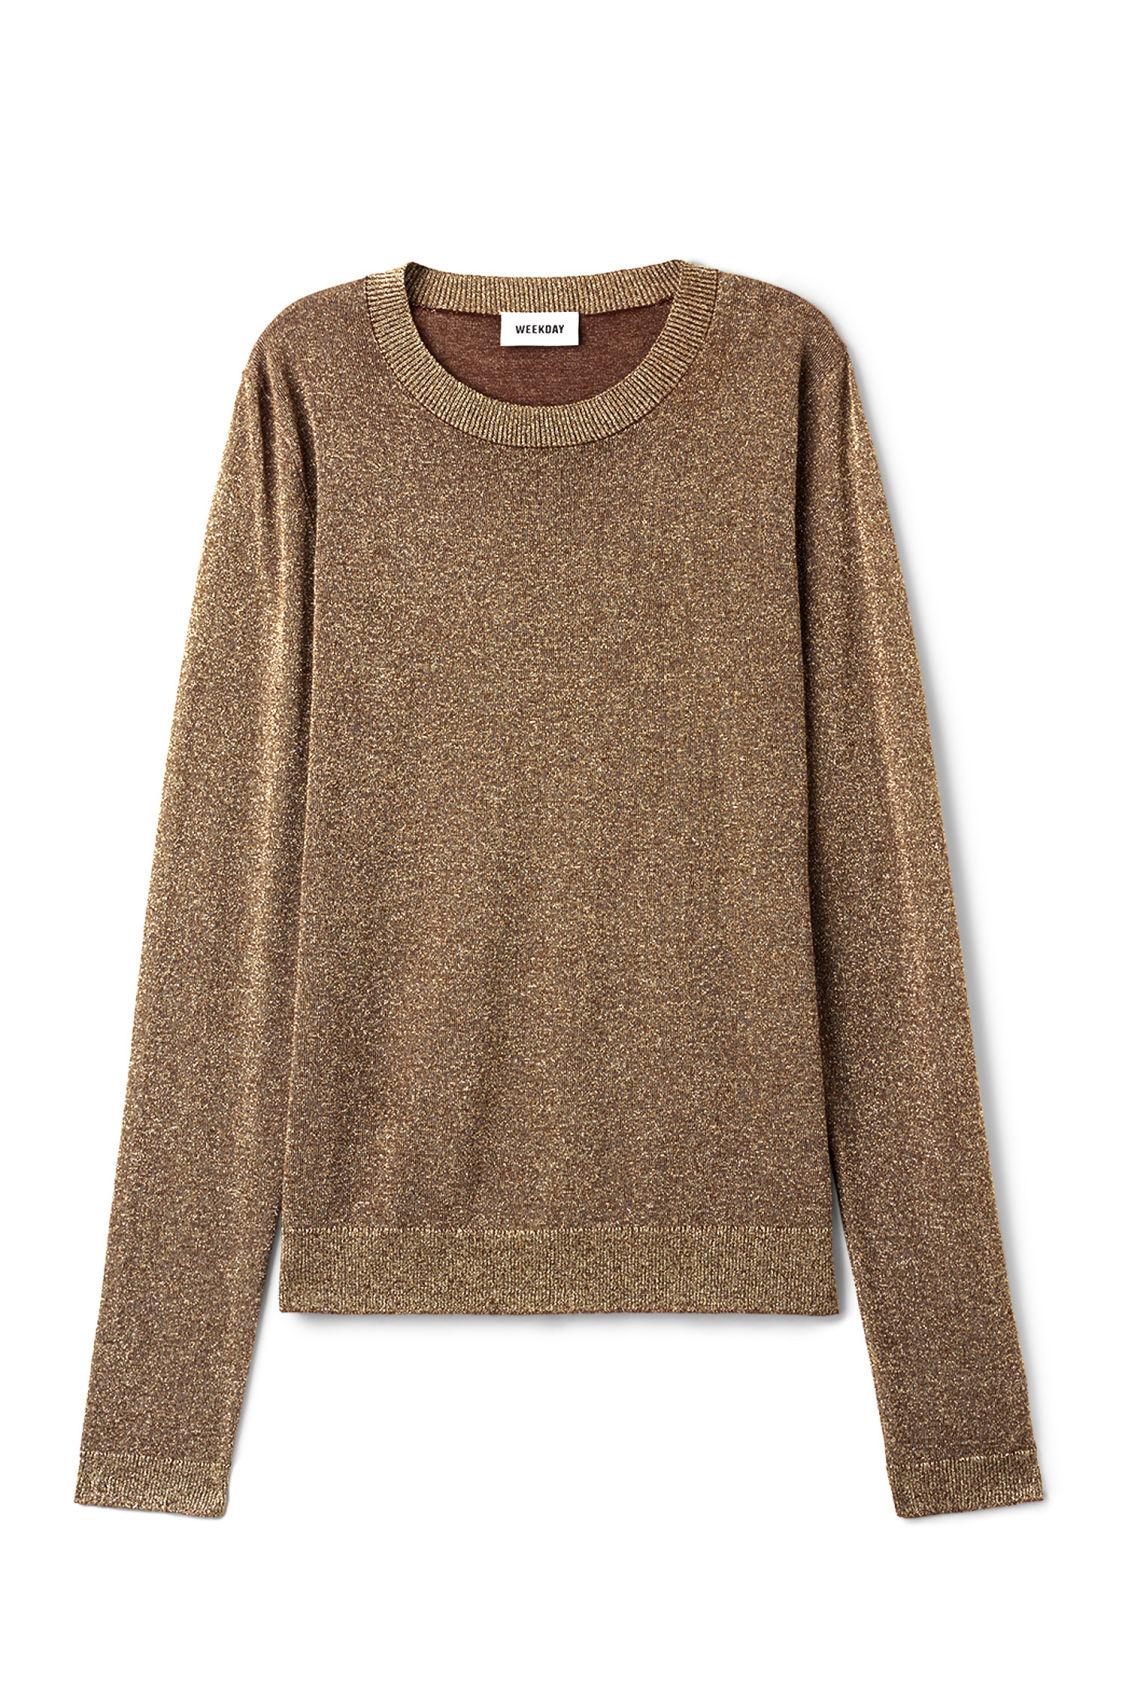 Websites Sale Online Cheap Best Prices Weekday Tania Lurex Sweater - Beige Low Price Fee Shipping Sale Online Cheap Sale Store JxOaT